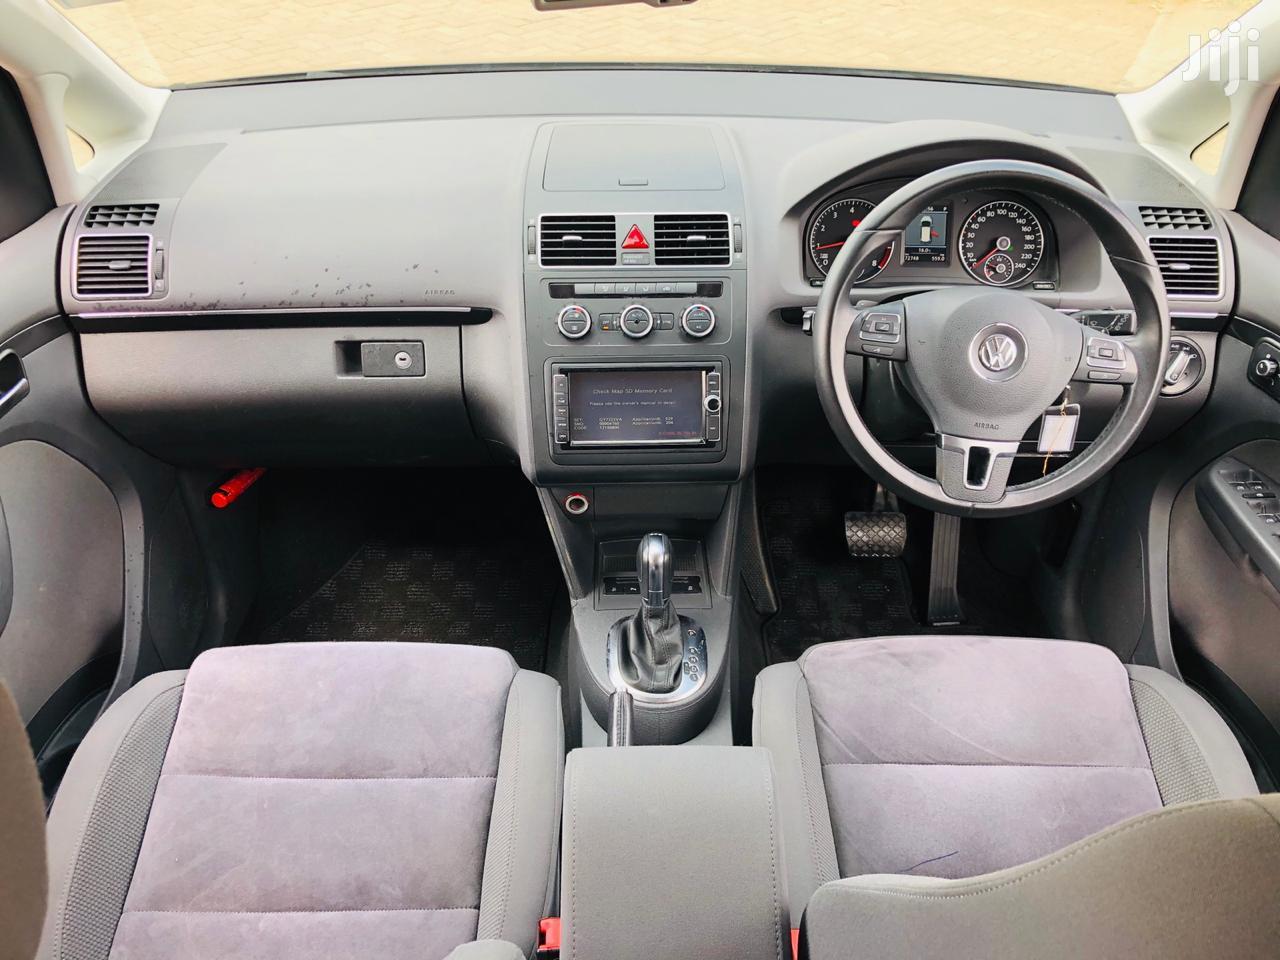 Volkswagen Touran 2013 Blue | Cars for sale in Nairobi South, Nairobi, Kenya